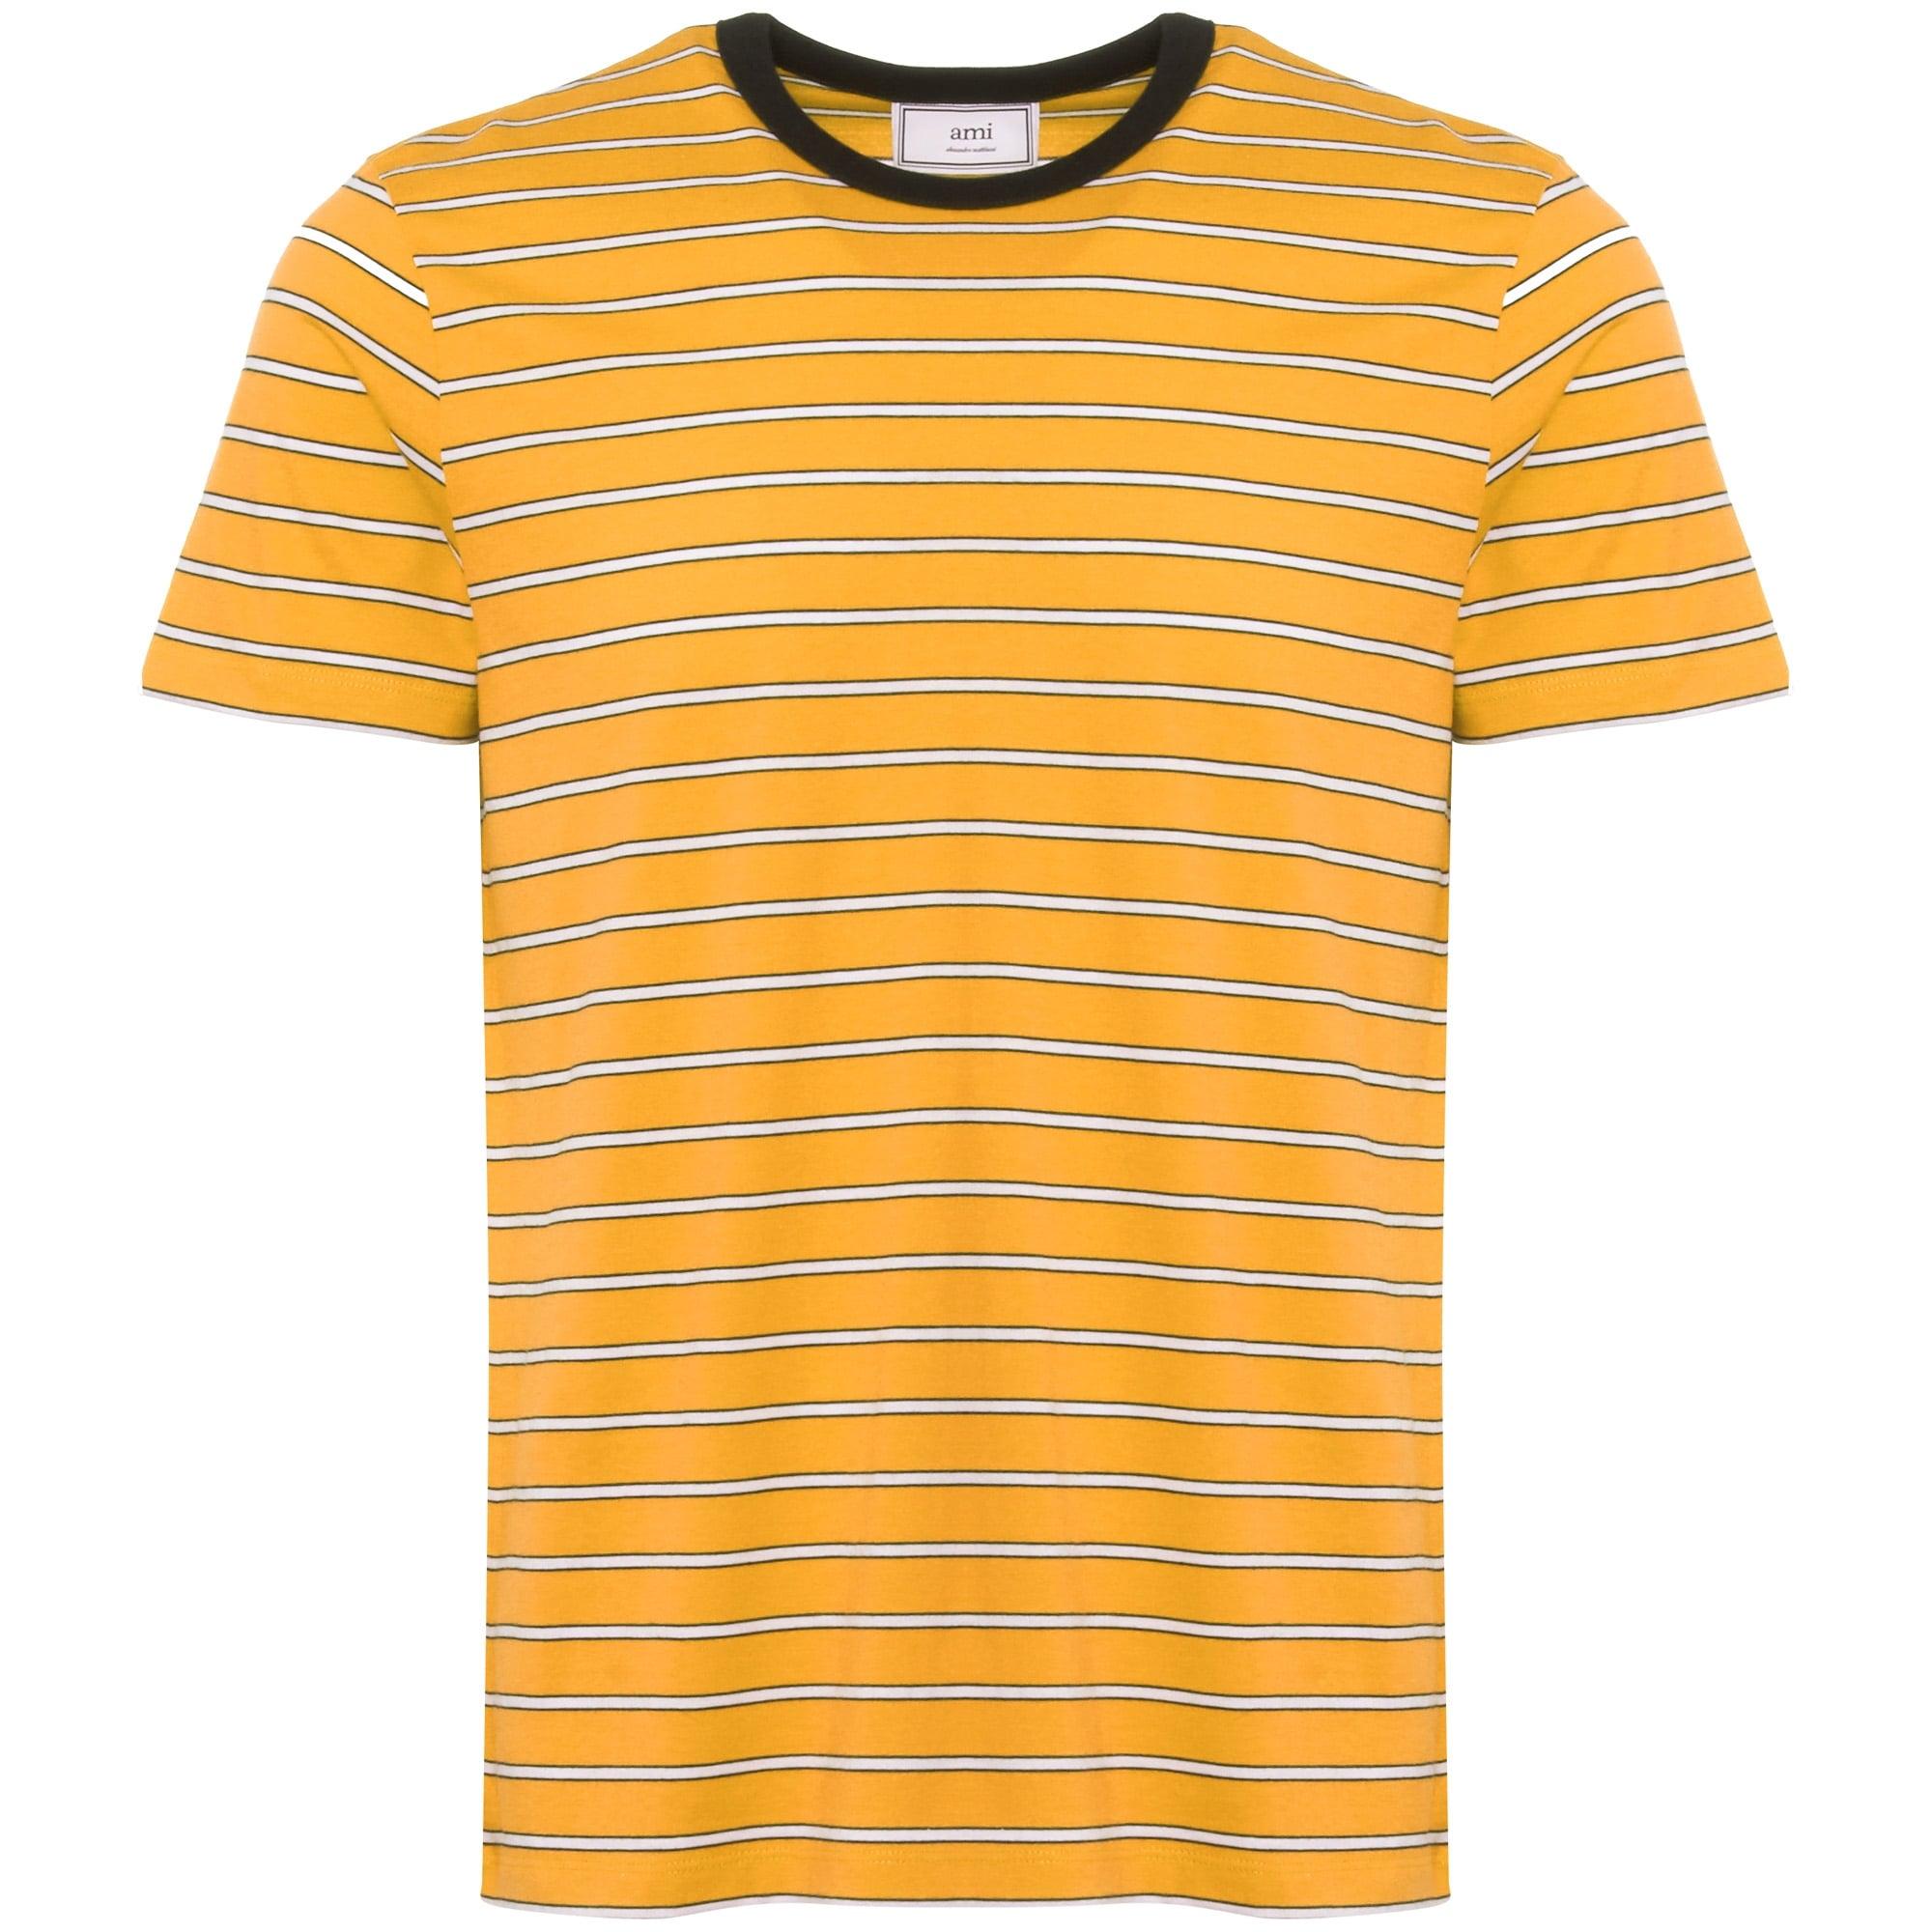 Striped Short Sleeves T-Shirt - Jaune